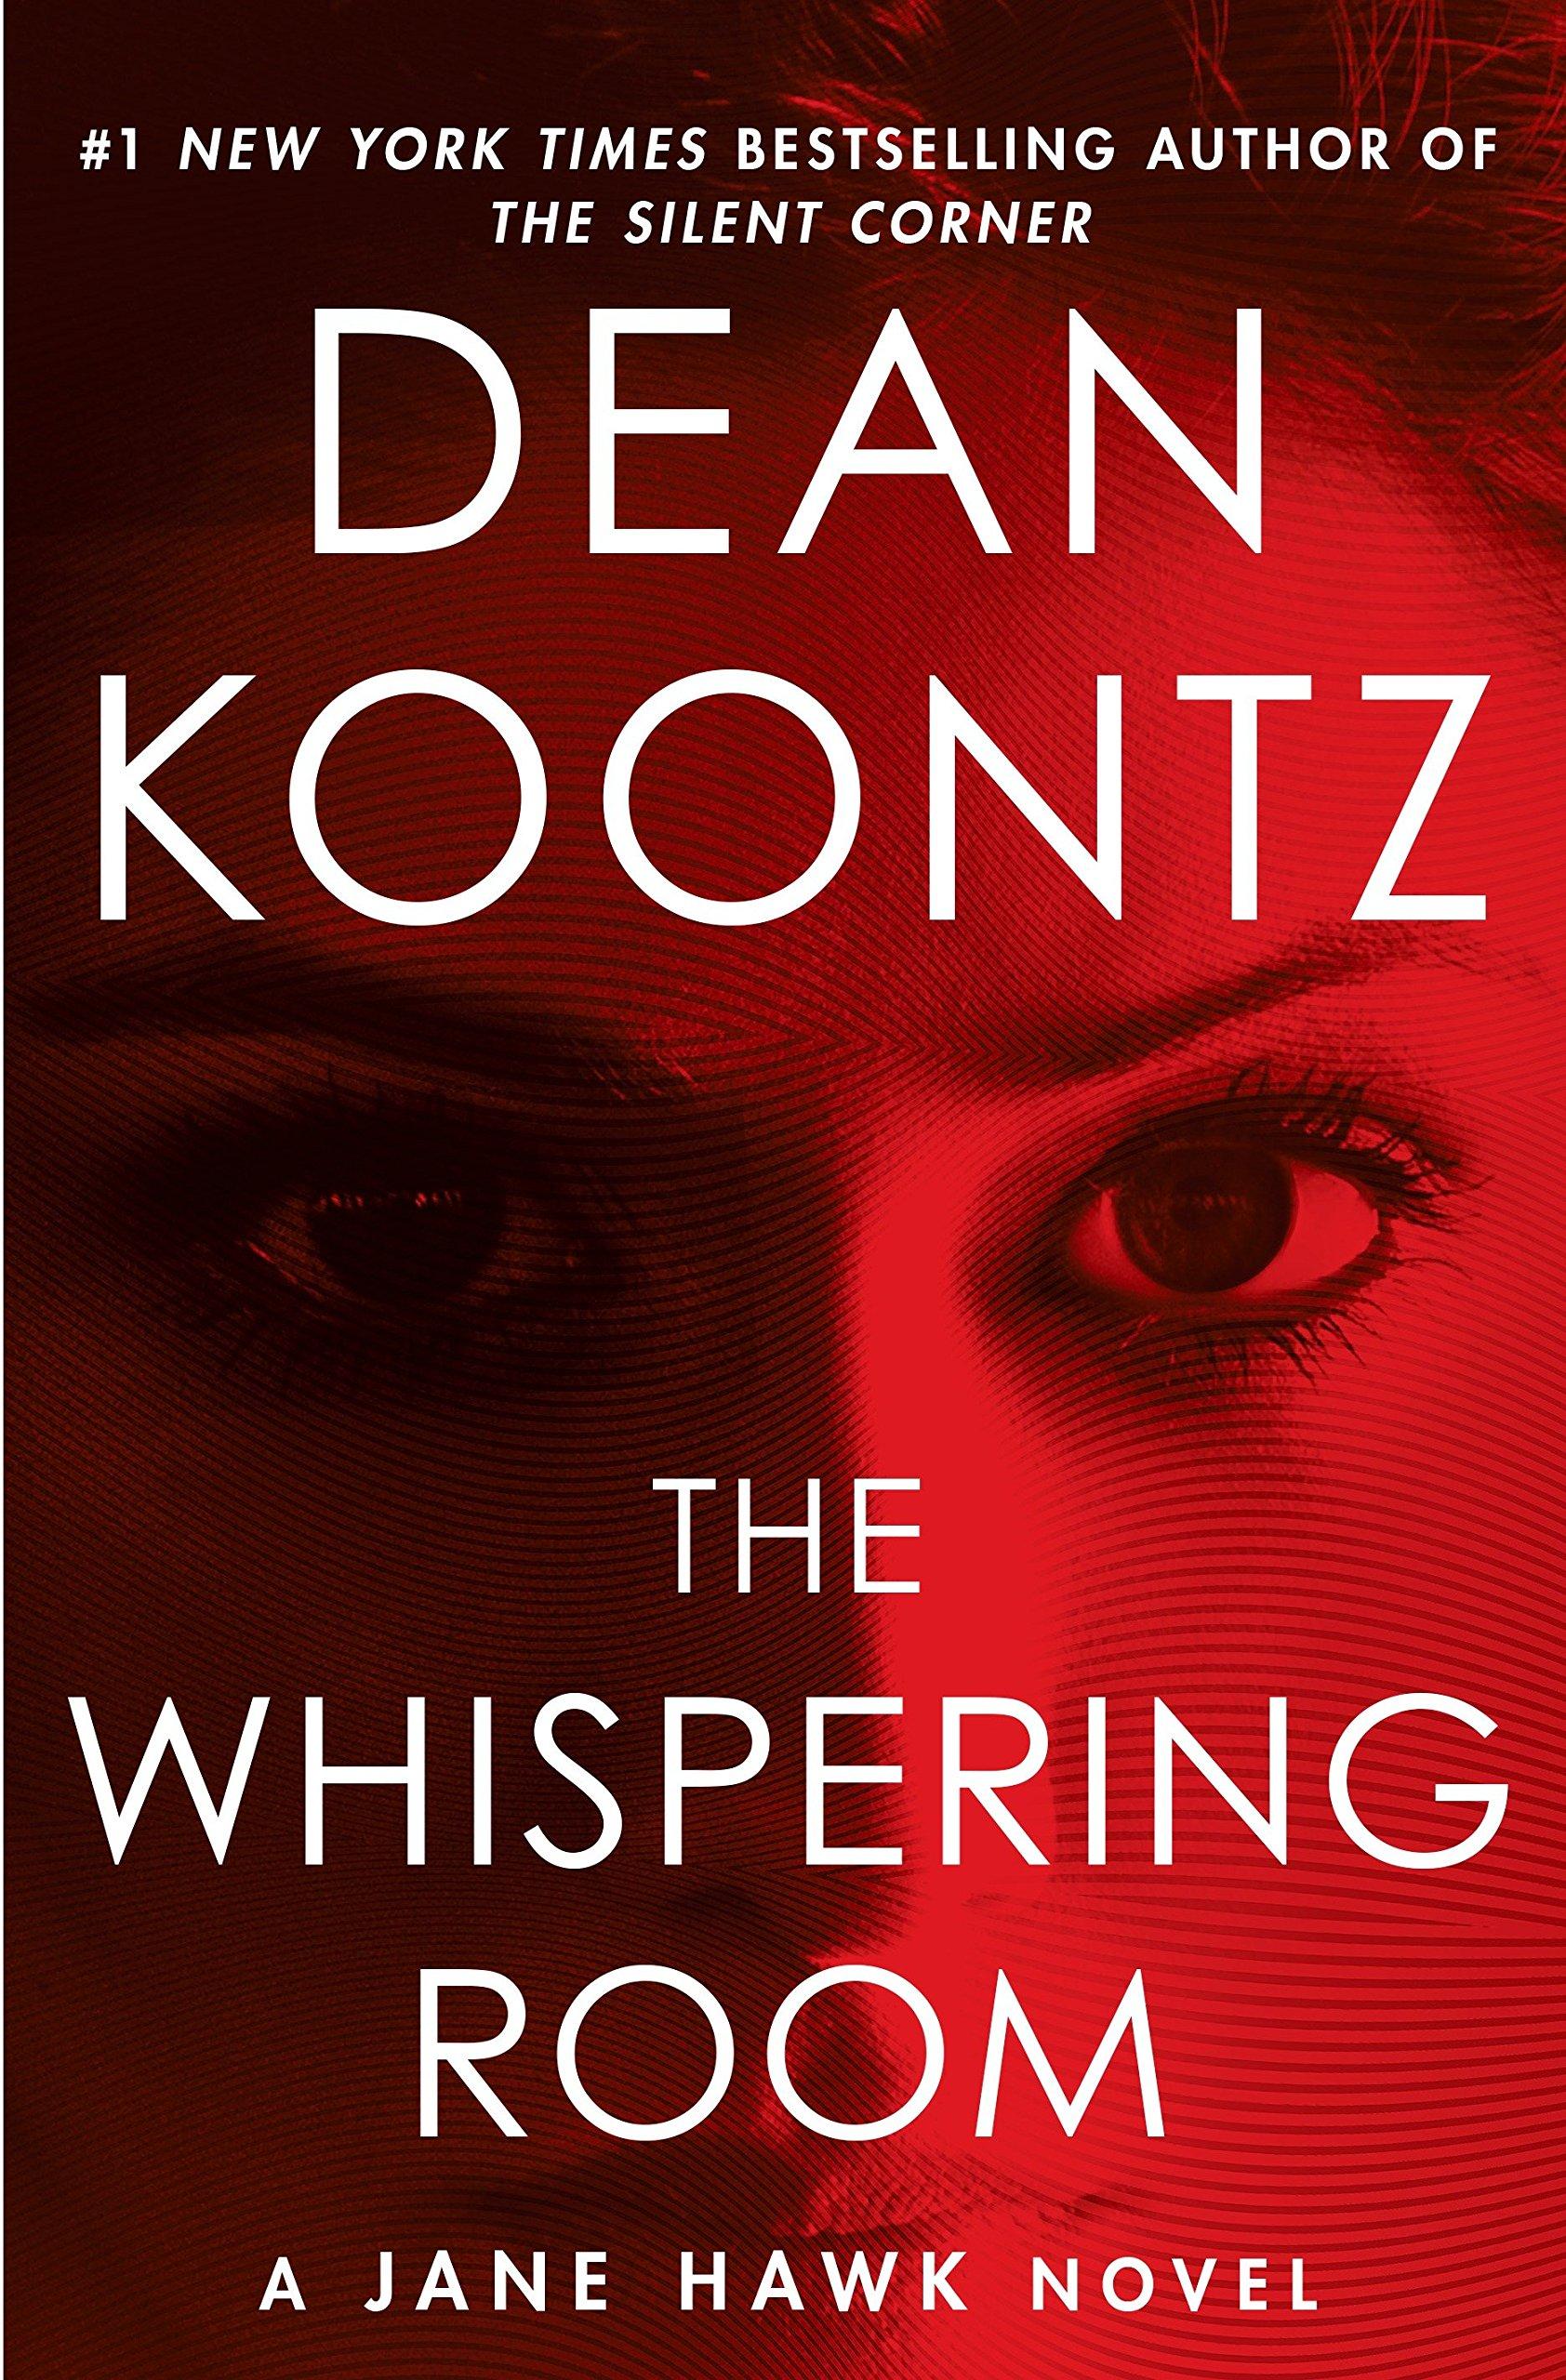 The Whispering Room: A Jane Hawk Novel pdf epub